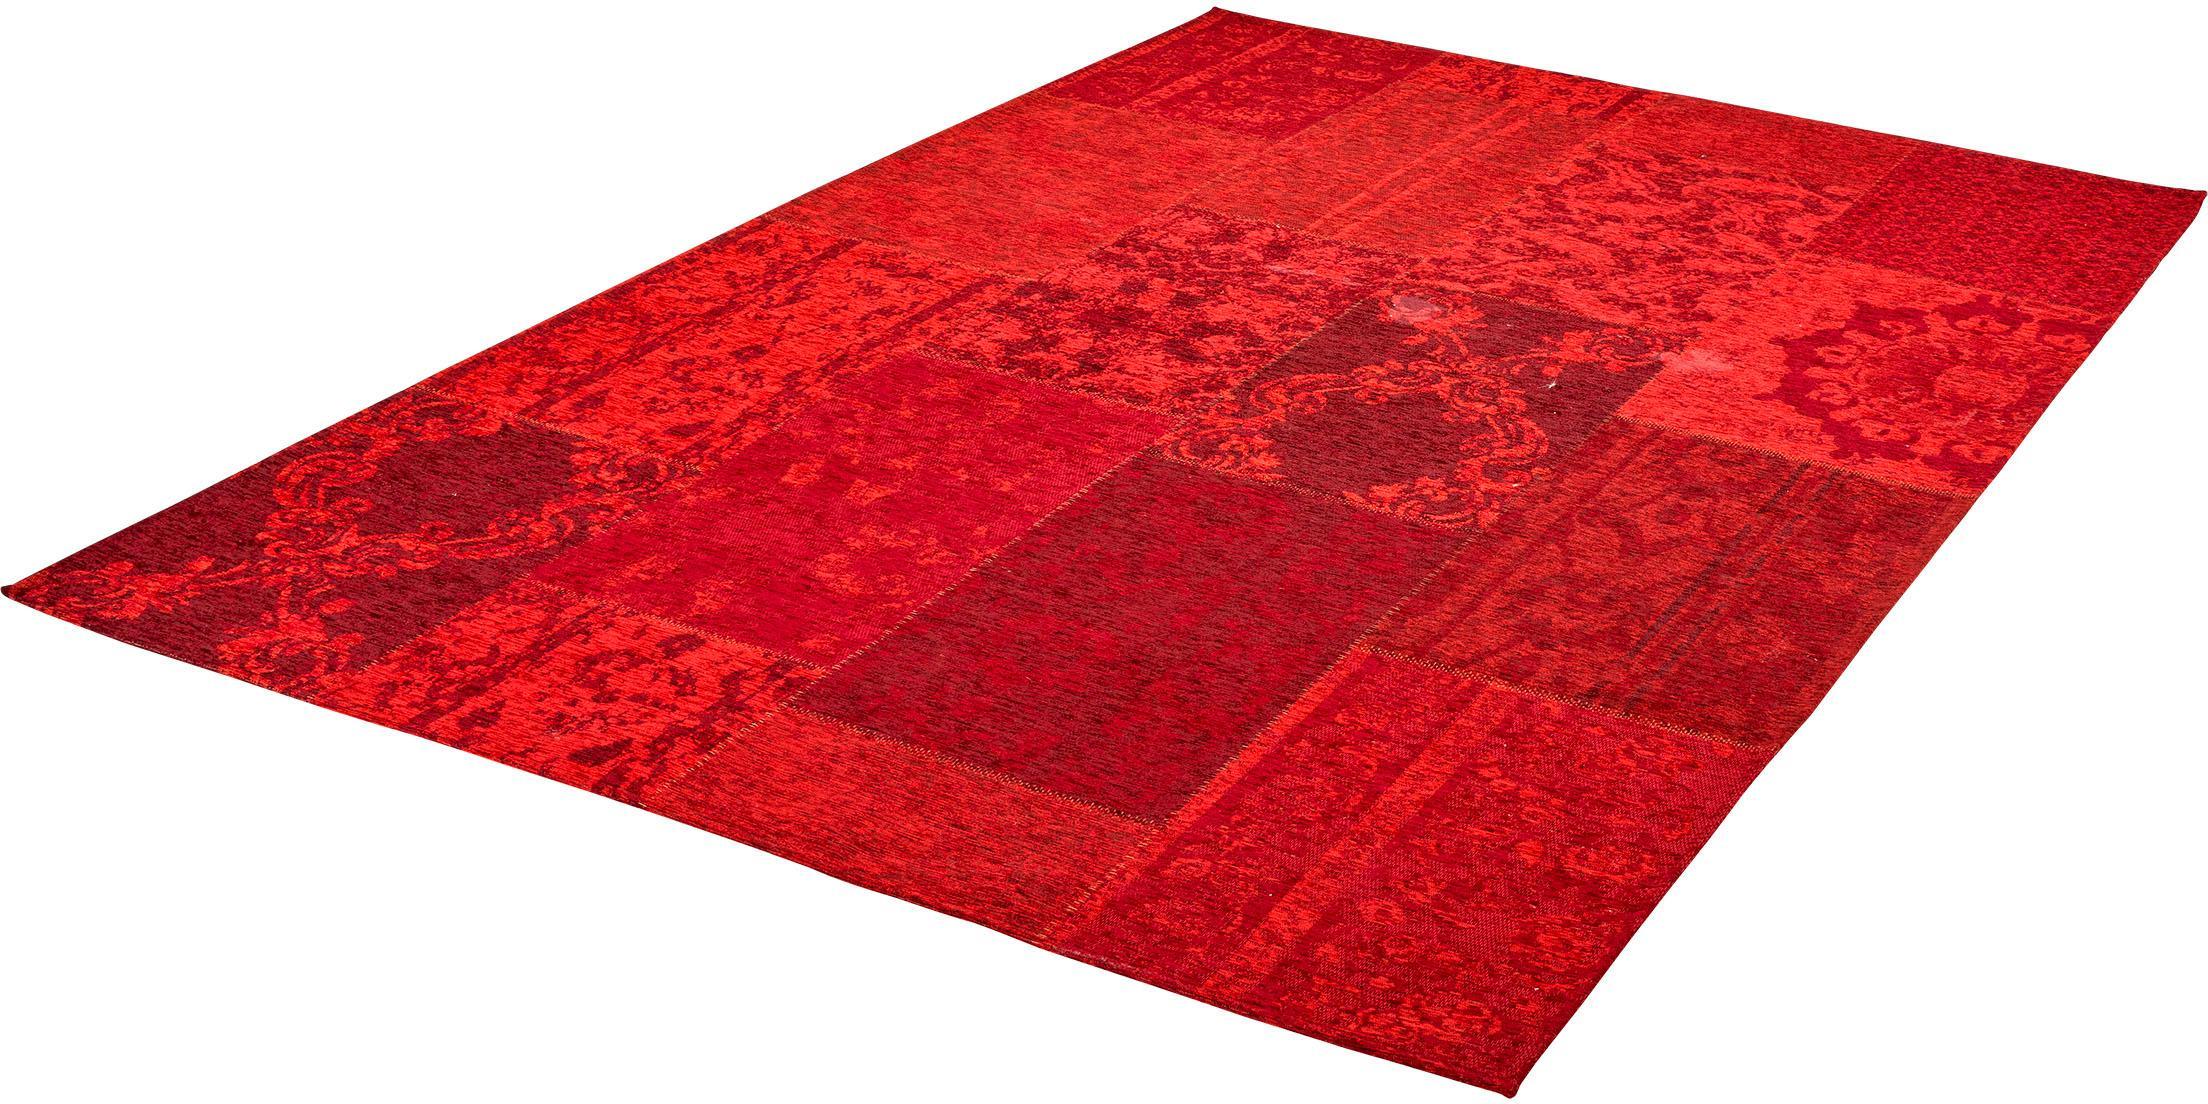 Teppich My Milano 571 Obsession rechteckig Höhe 10 mm maschinell gewebt